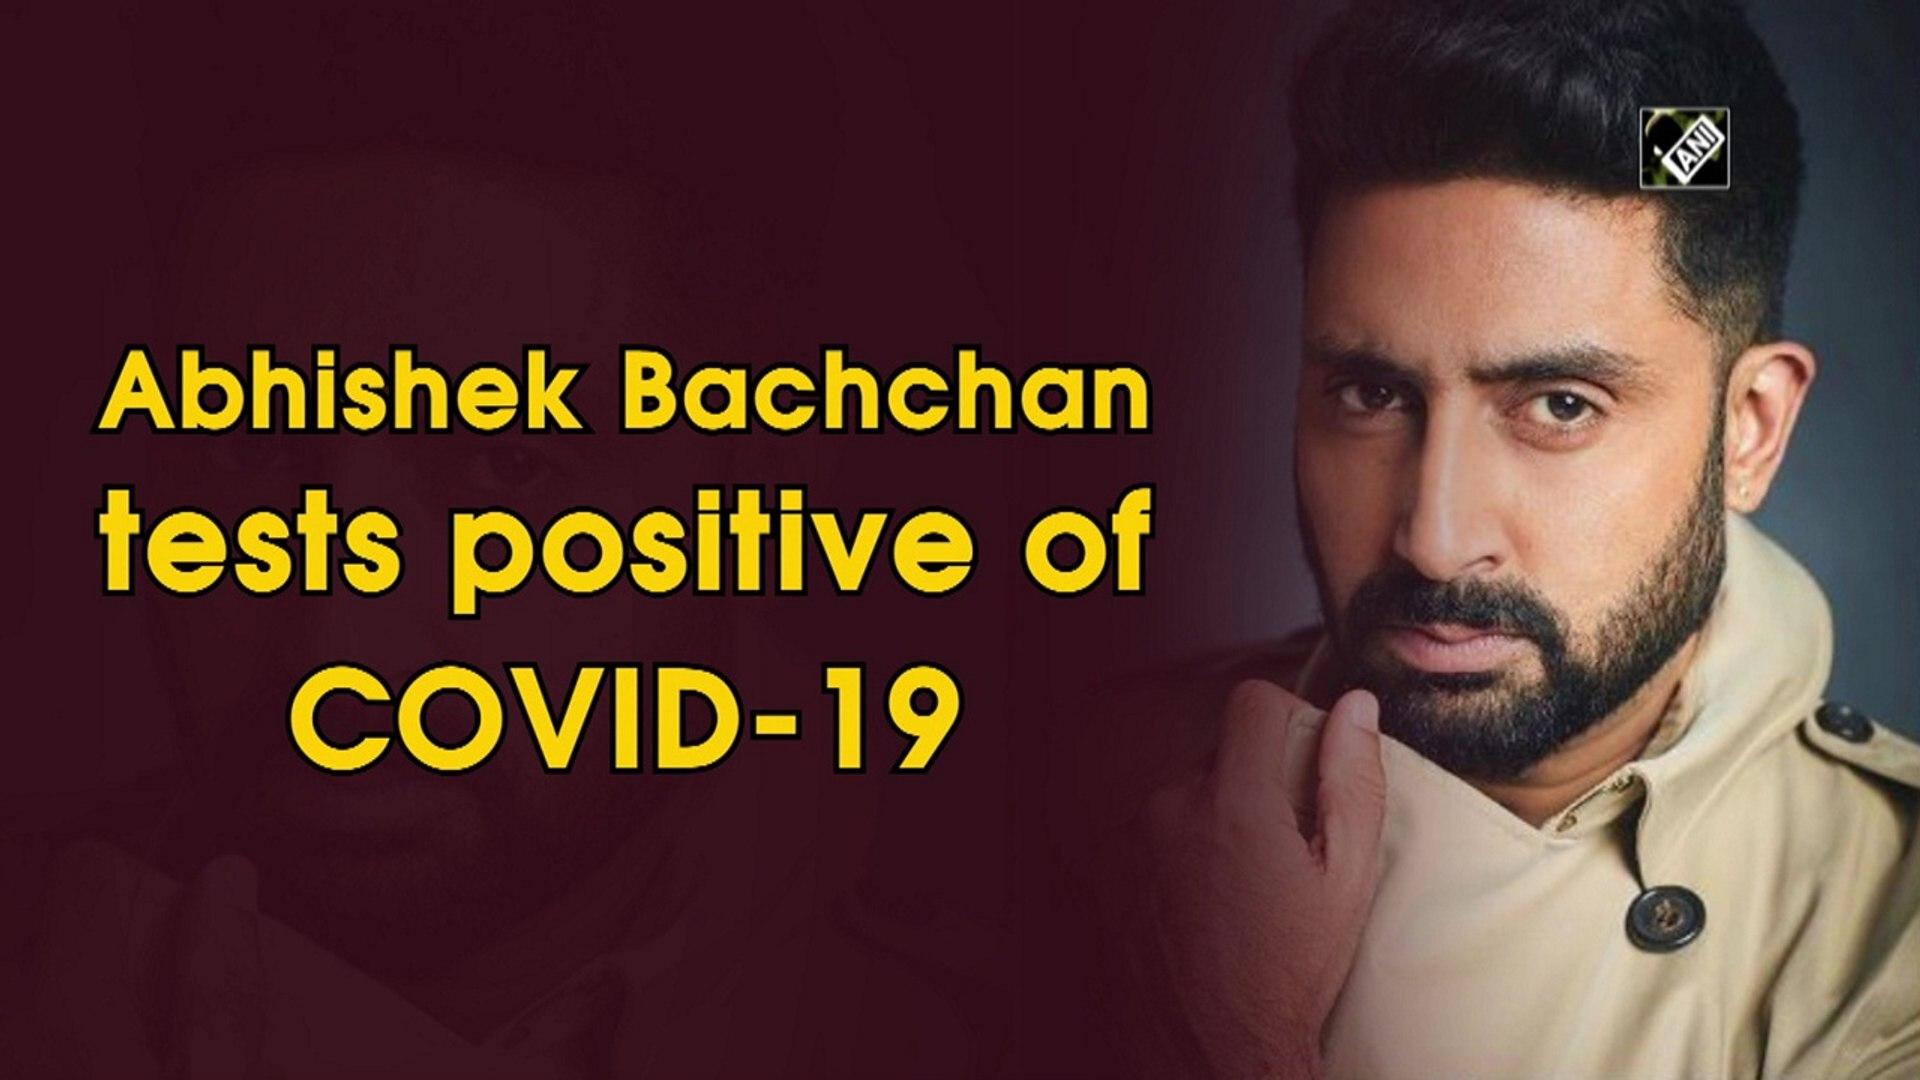 Abhishek Bachchan tests positive of Covid-19